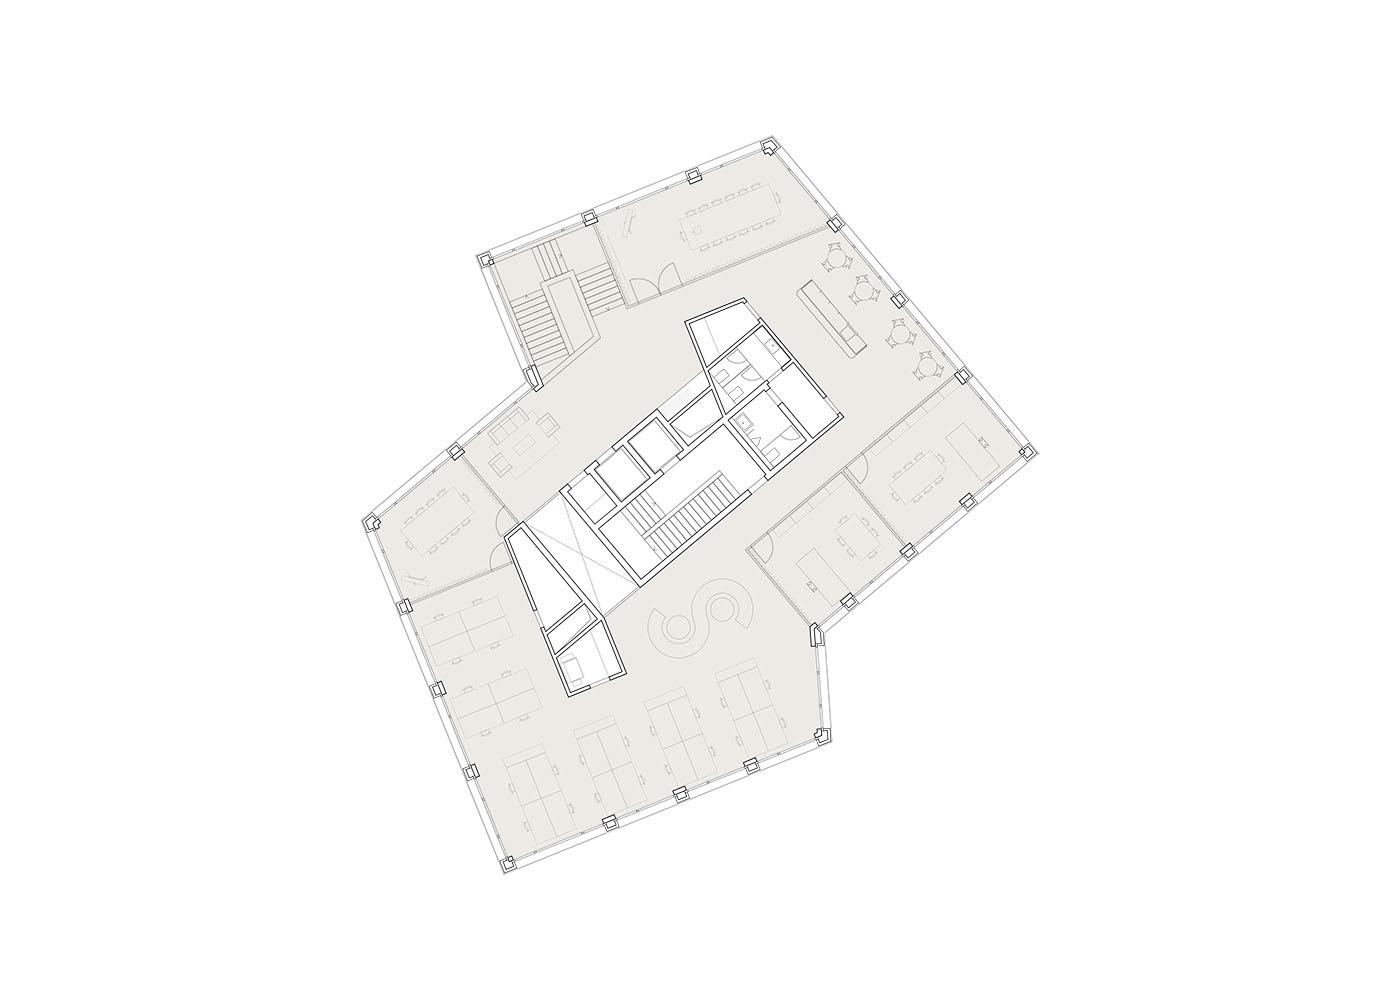 buan architekten – Studienauftrag Kanzlei-Kreisel Emmenbrücke – 1.Obergeschoss